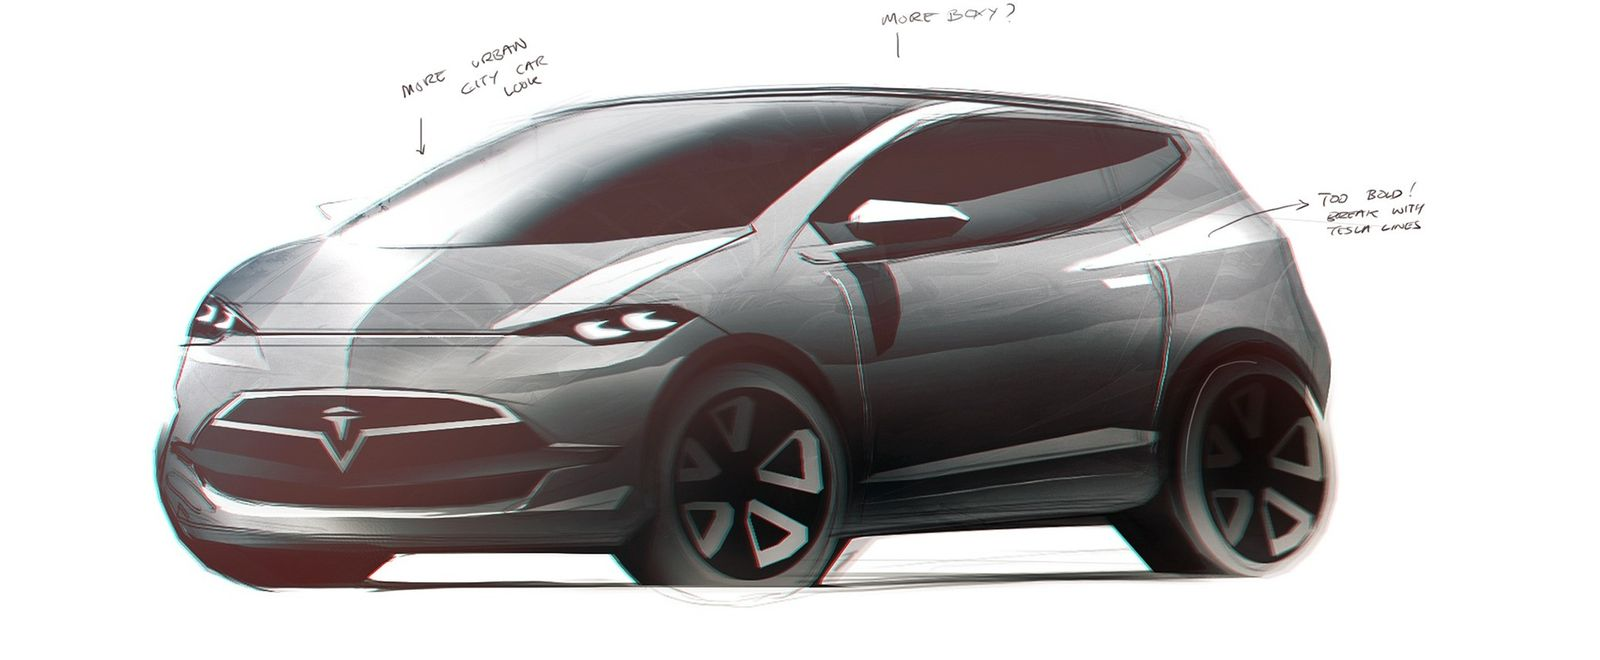 2016 Tesla Model C city car: design sketches | carwow